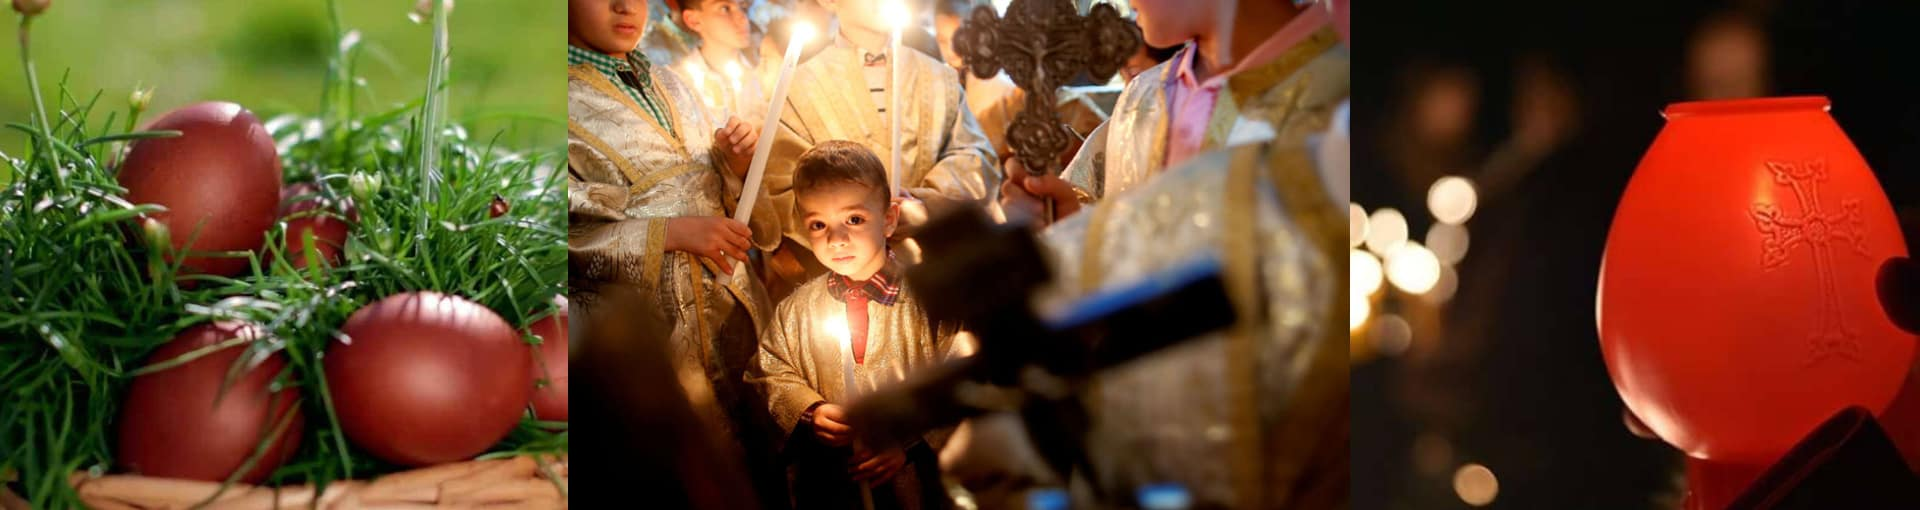 How do Armenians celebrate Easter?